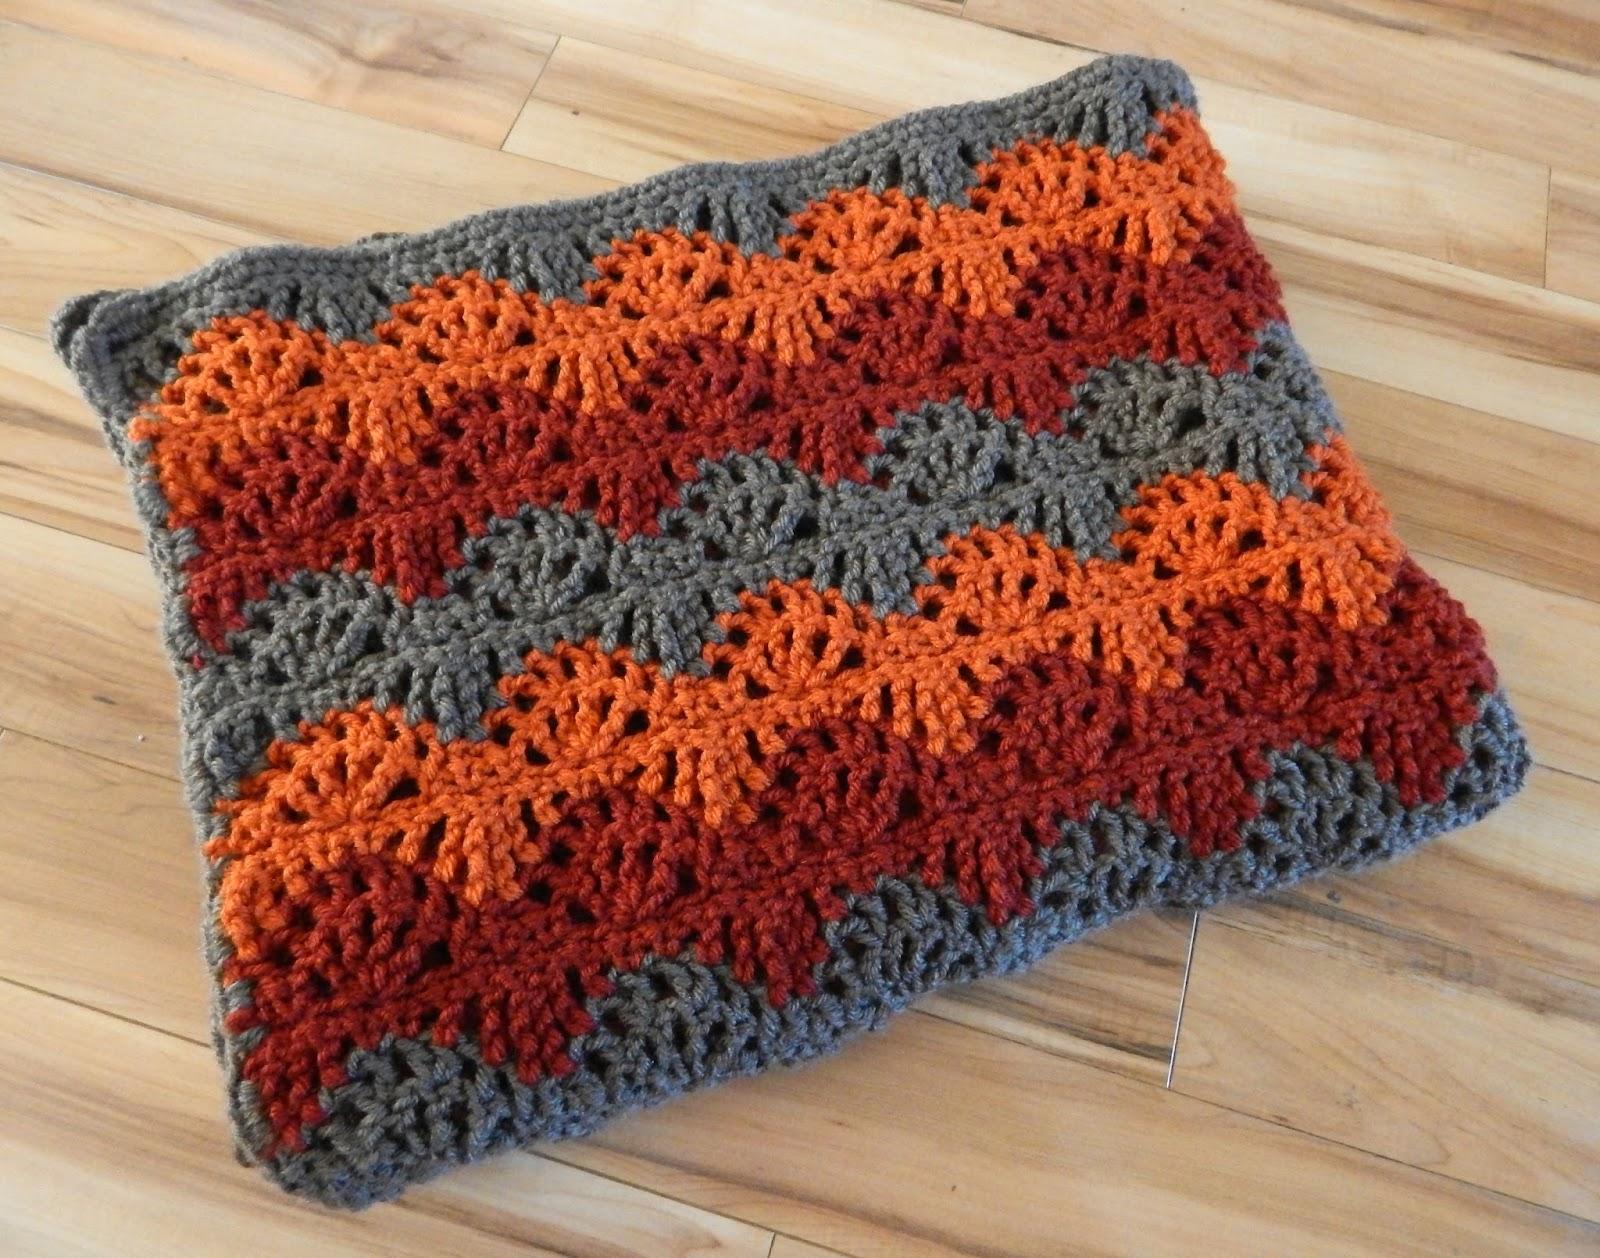 Battle of the Stitches: Ripple Lace Crochet Stitch Tutorial